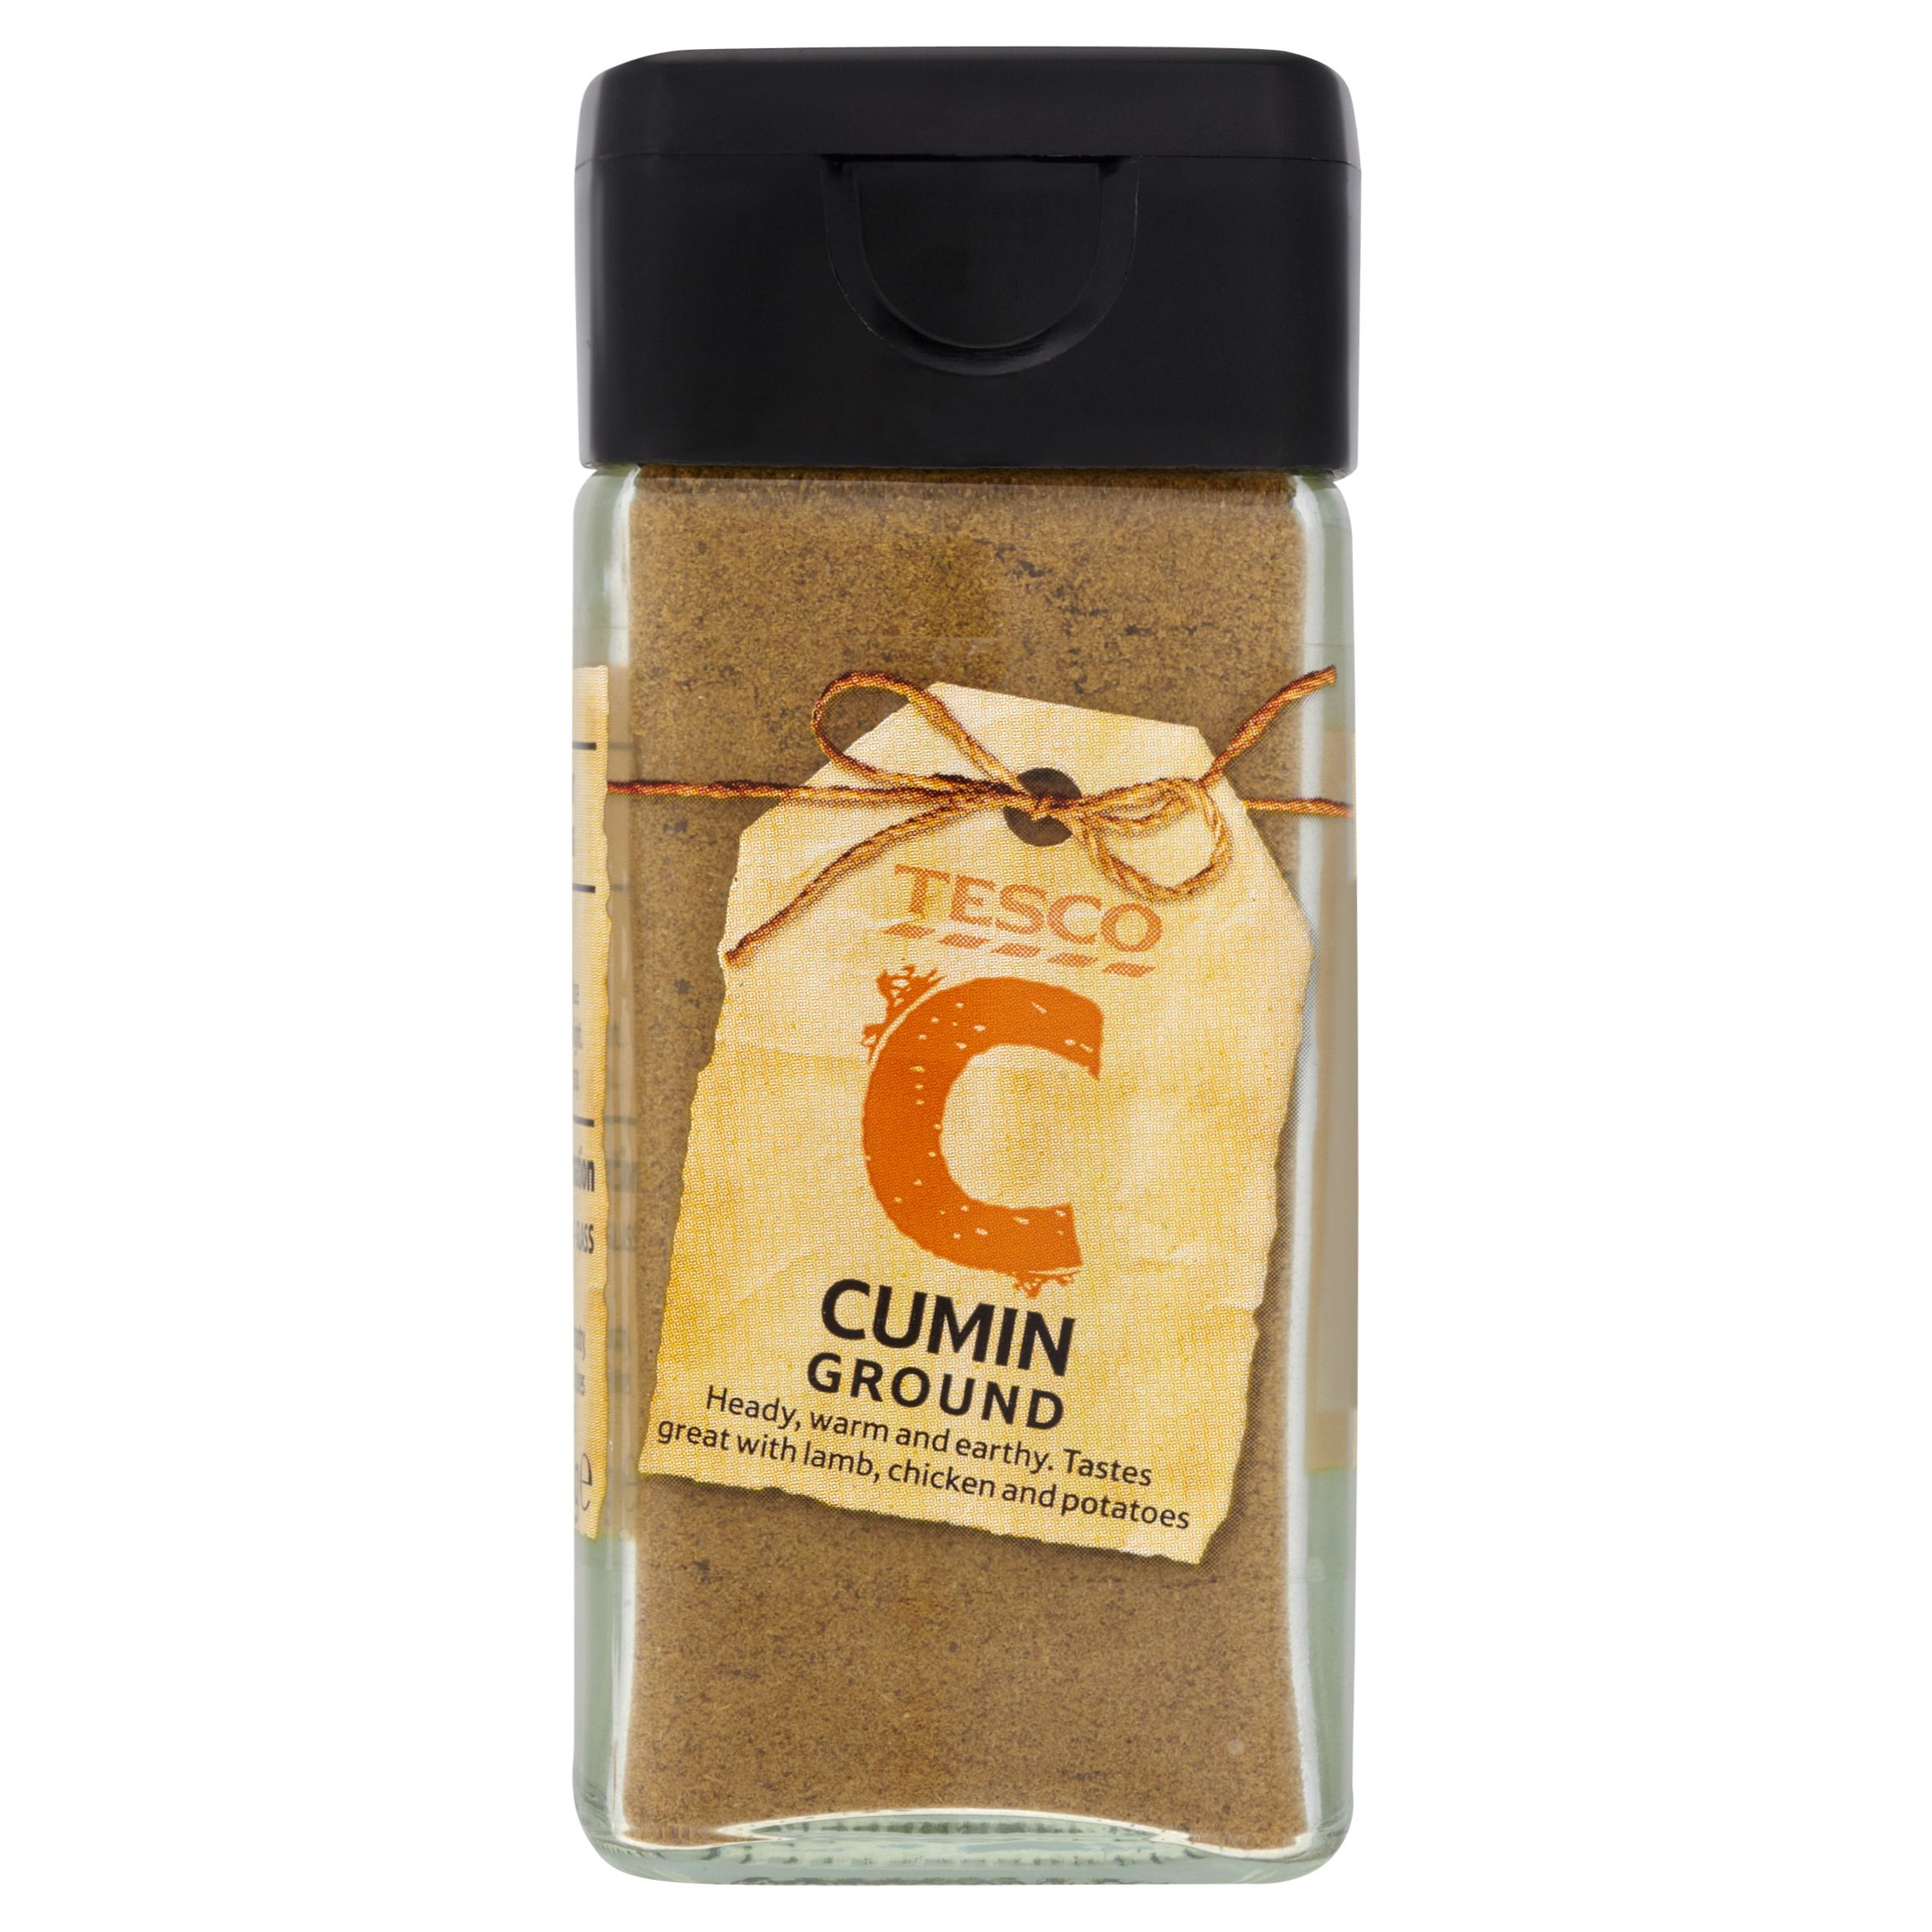 Tesco Cumin Ground Heady Warm And Earthy Tastes Great